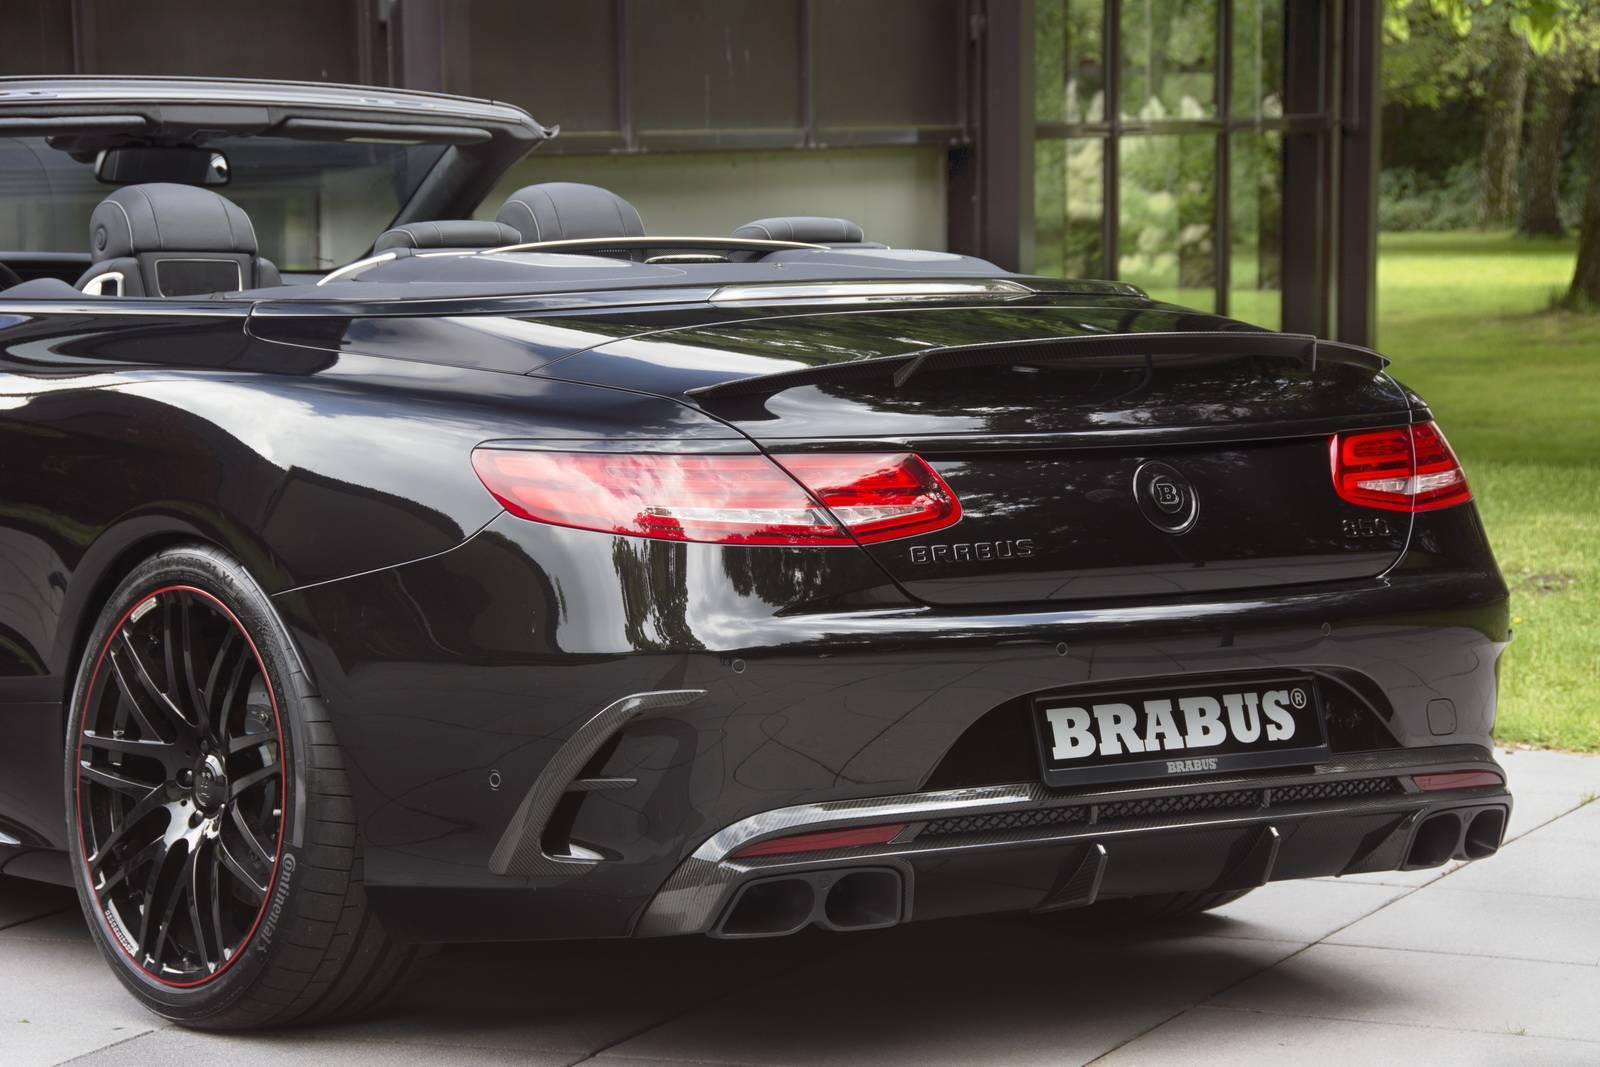 Official: 850hp Brabus Mercedes-AMG S63 Cabriolet - GTspirit